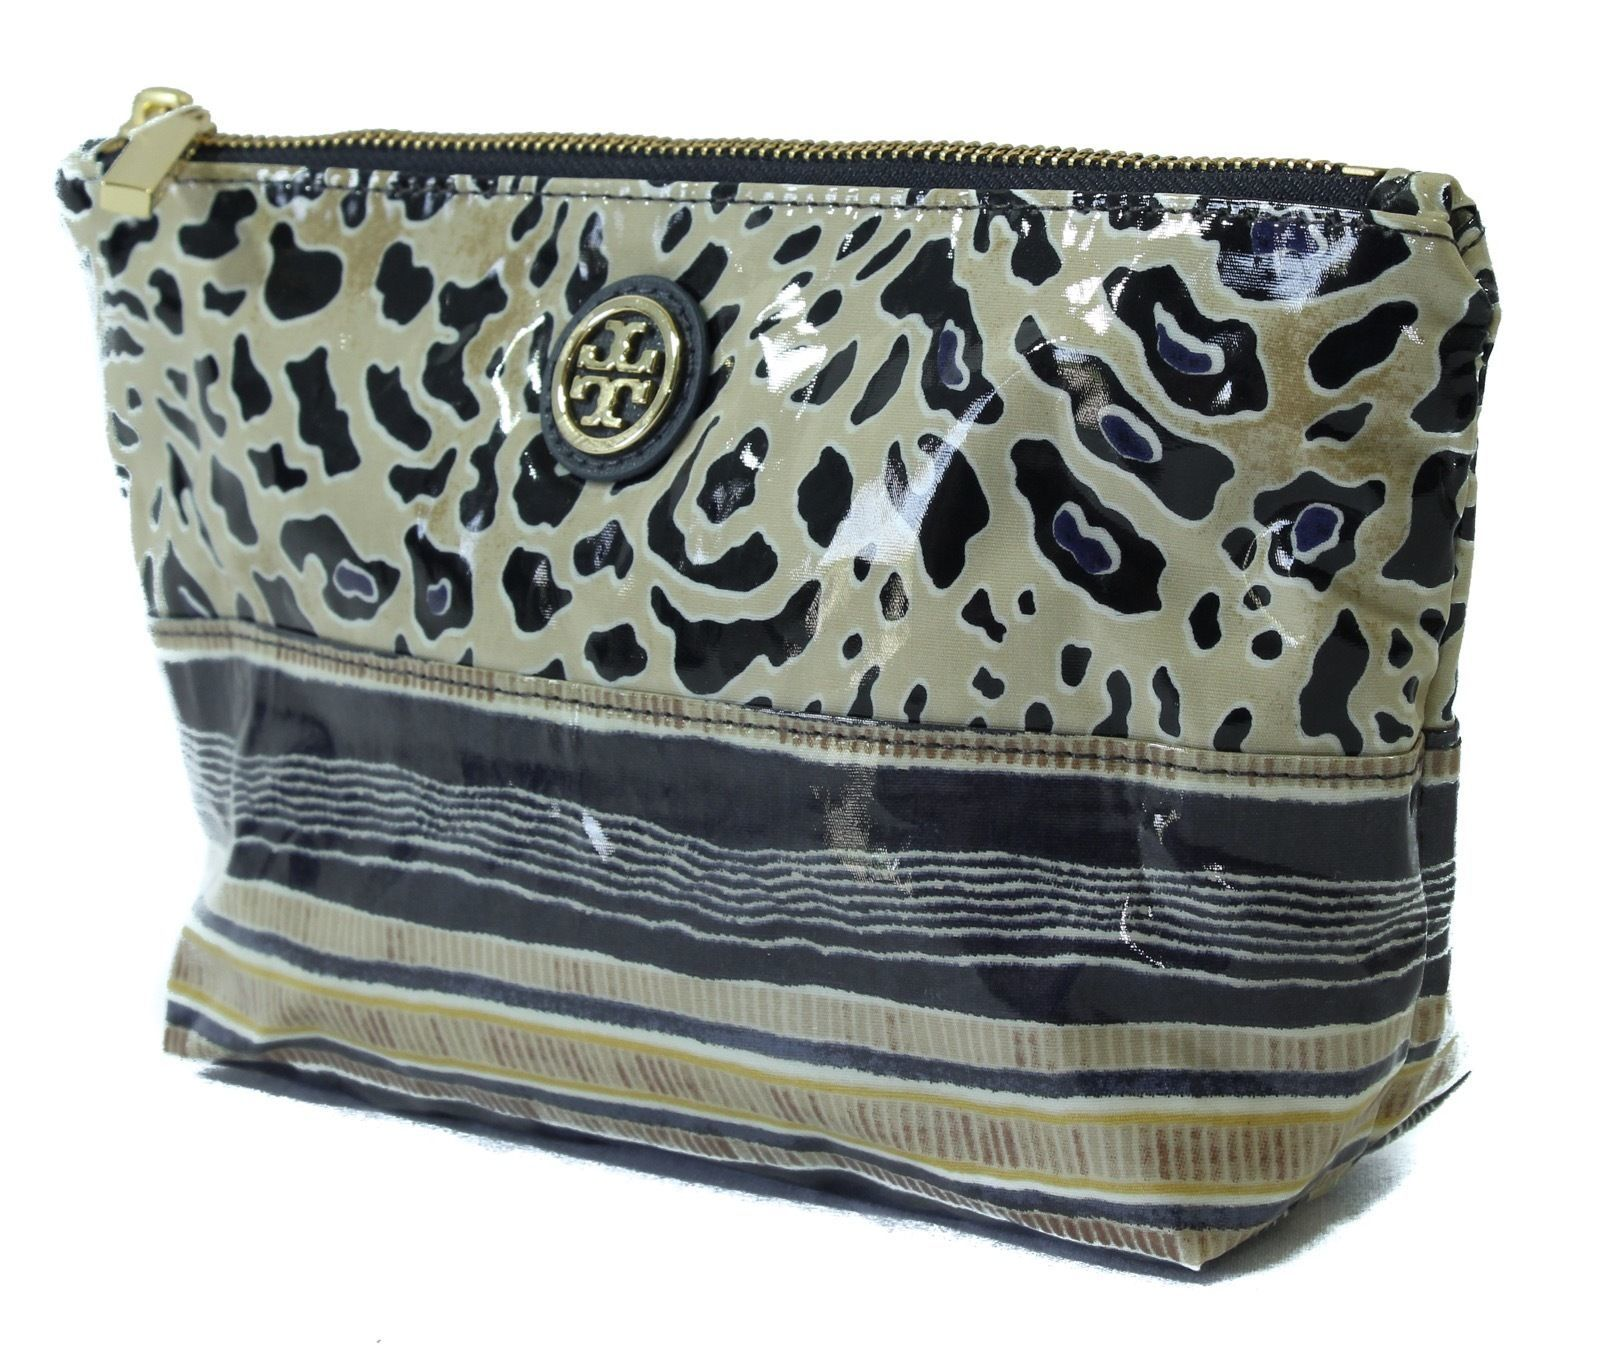 NIB TORY BURCH Small Slouchy Cosmetic Case Bag, Multicolor